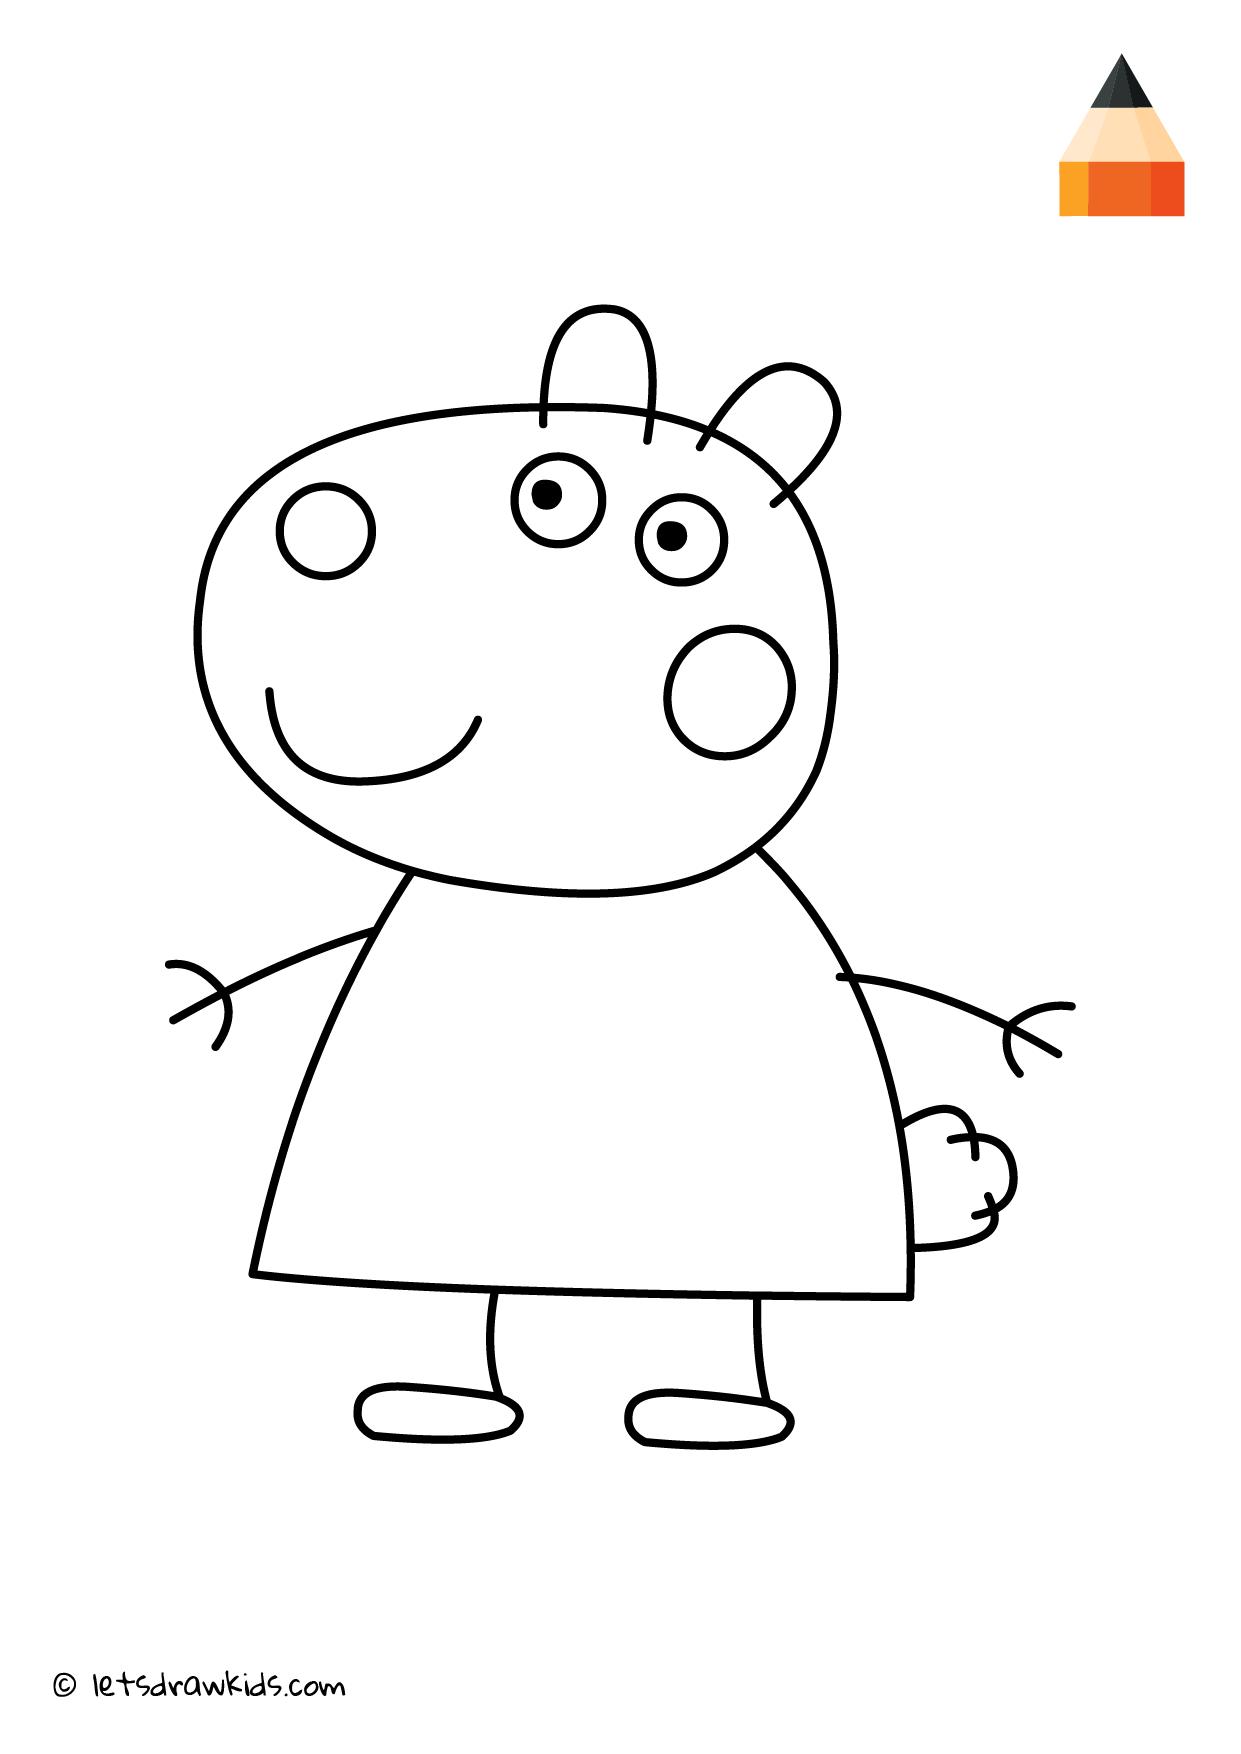 Coloring Page Peppa Pig Suzy Sheep Peppa Pig Coloring Pages Peppa Pig Drawing Peppa Pig Painting